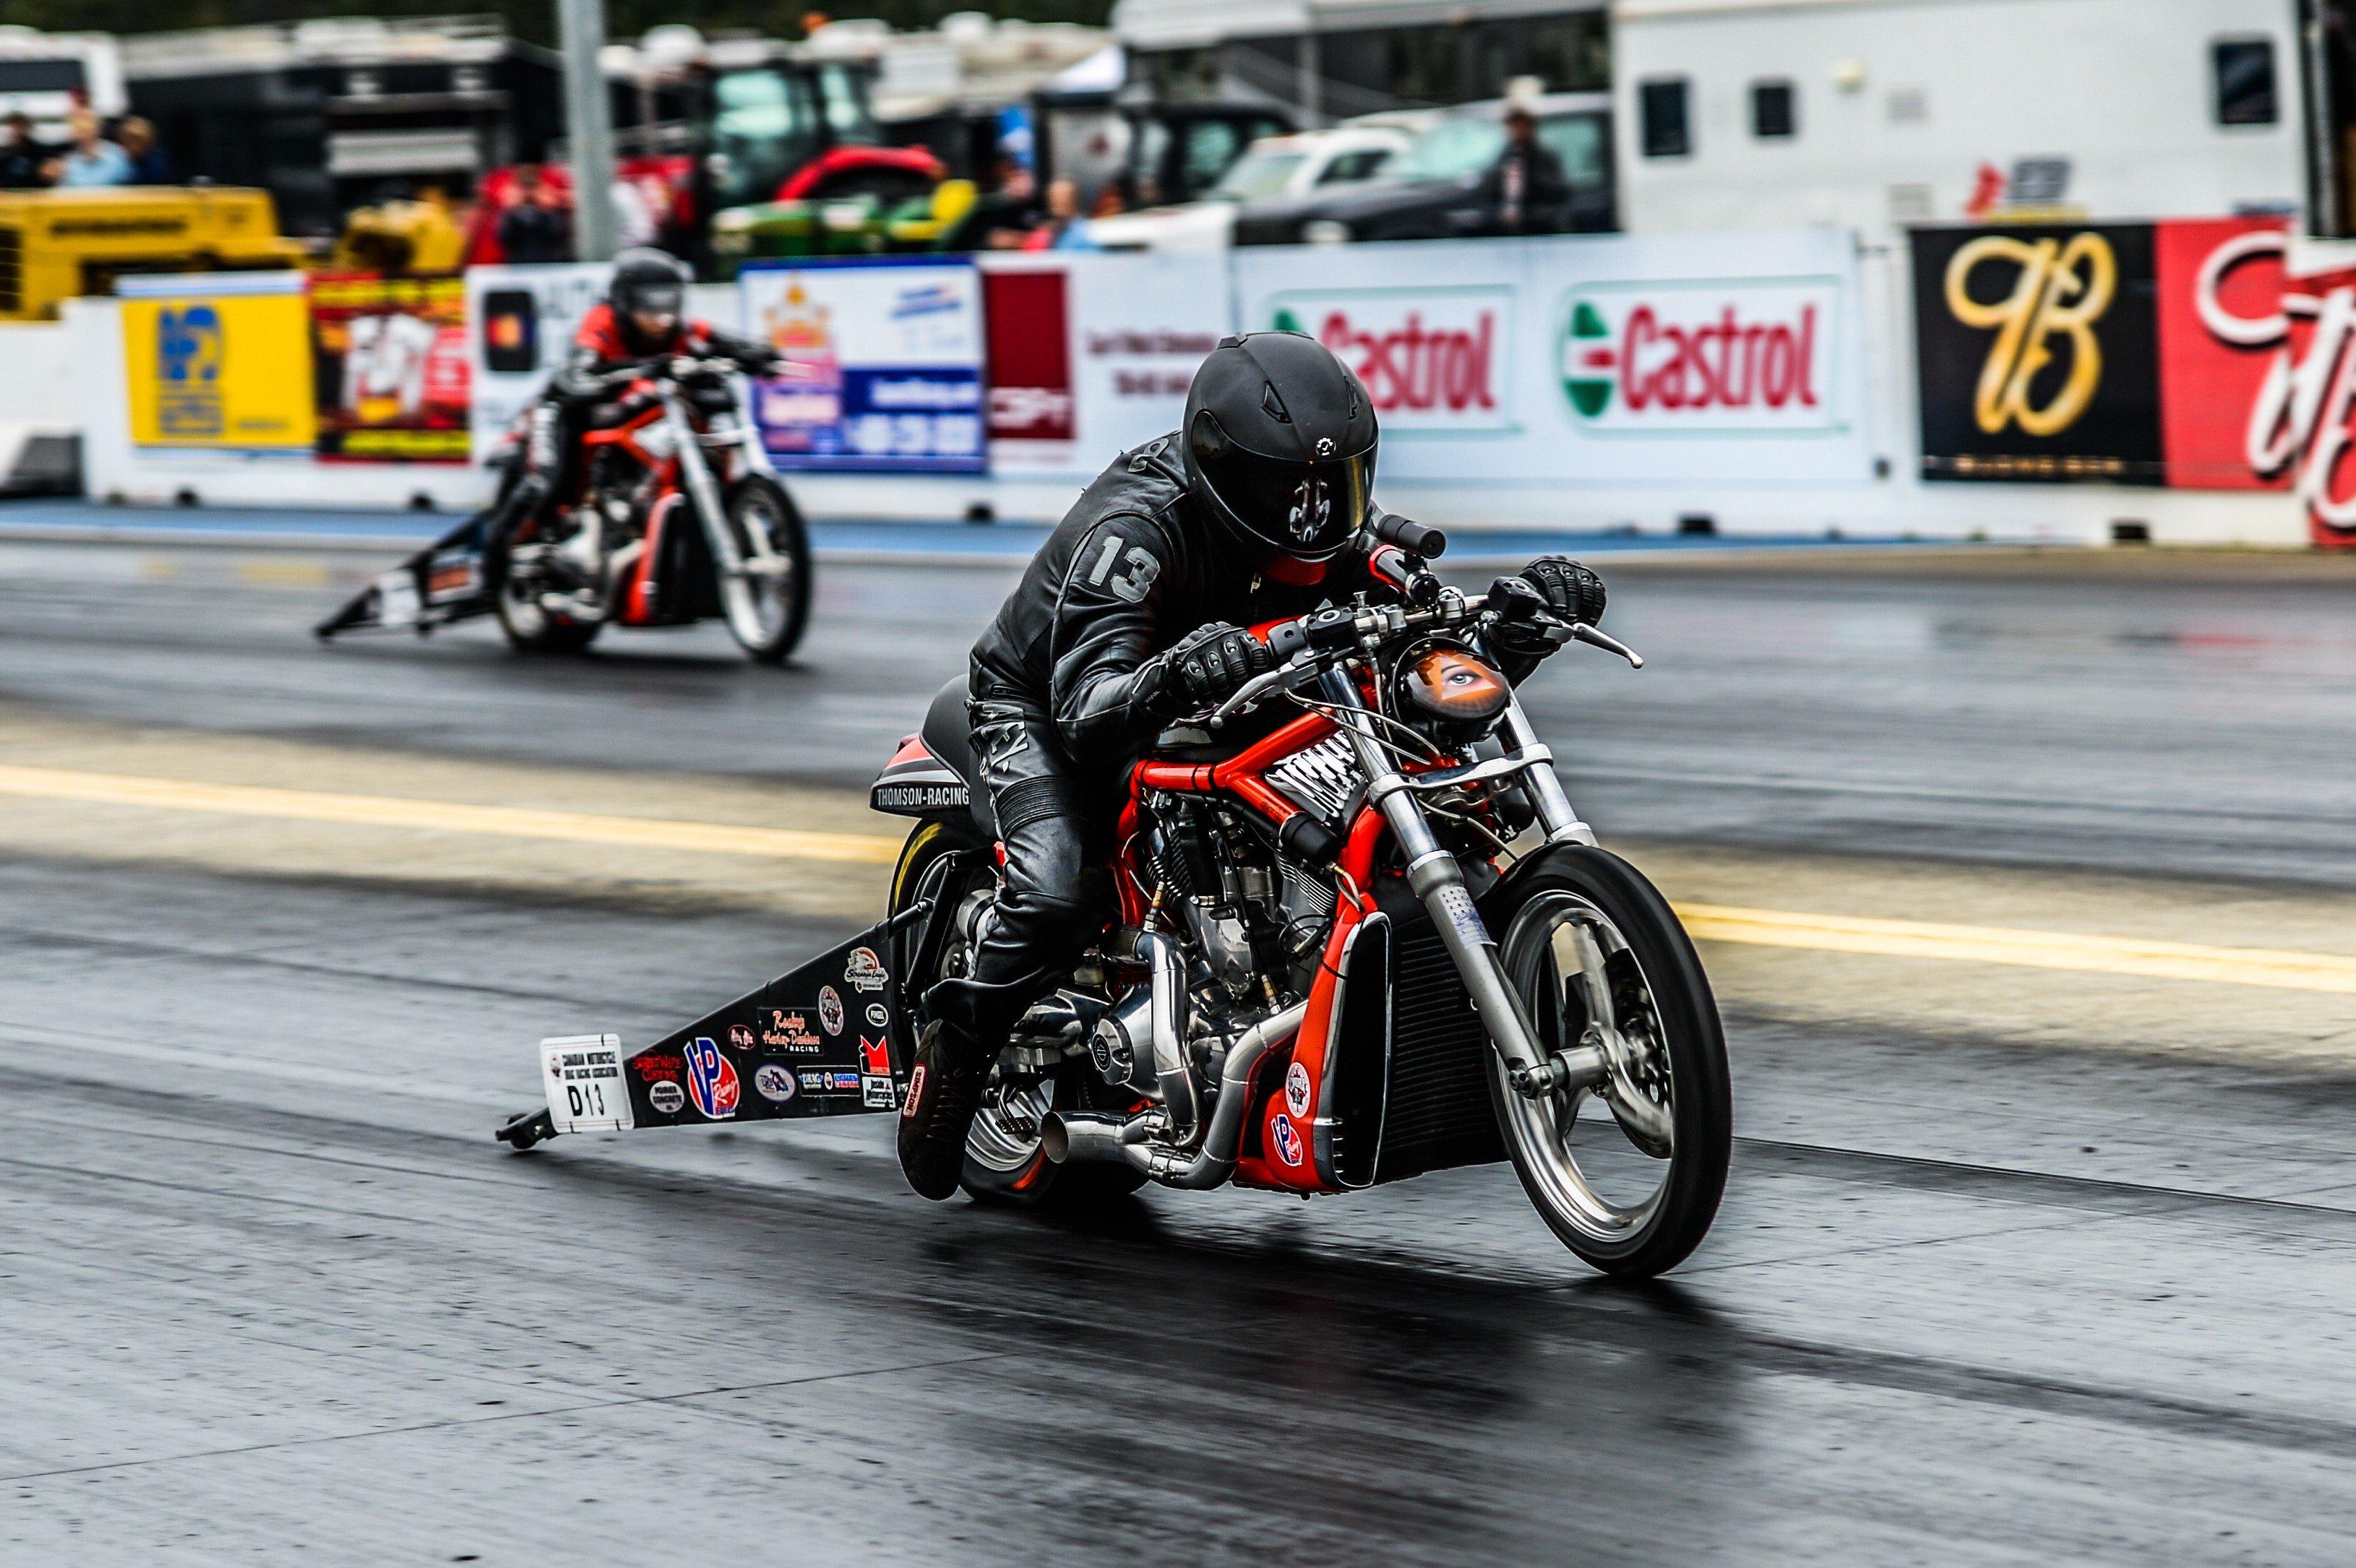 DRAG RACING Race Hot Rod Rods Motorbike Motorcycle Bike H Wallpaper